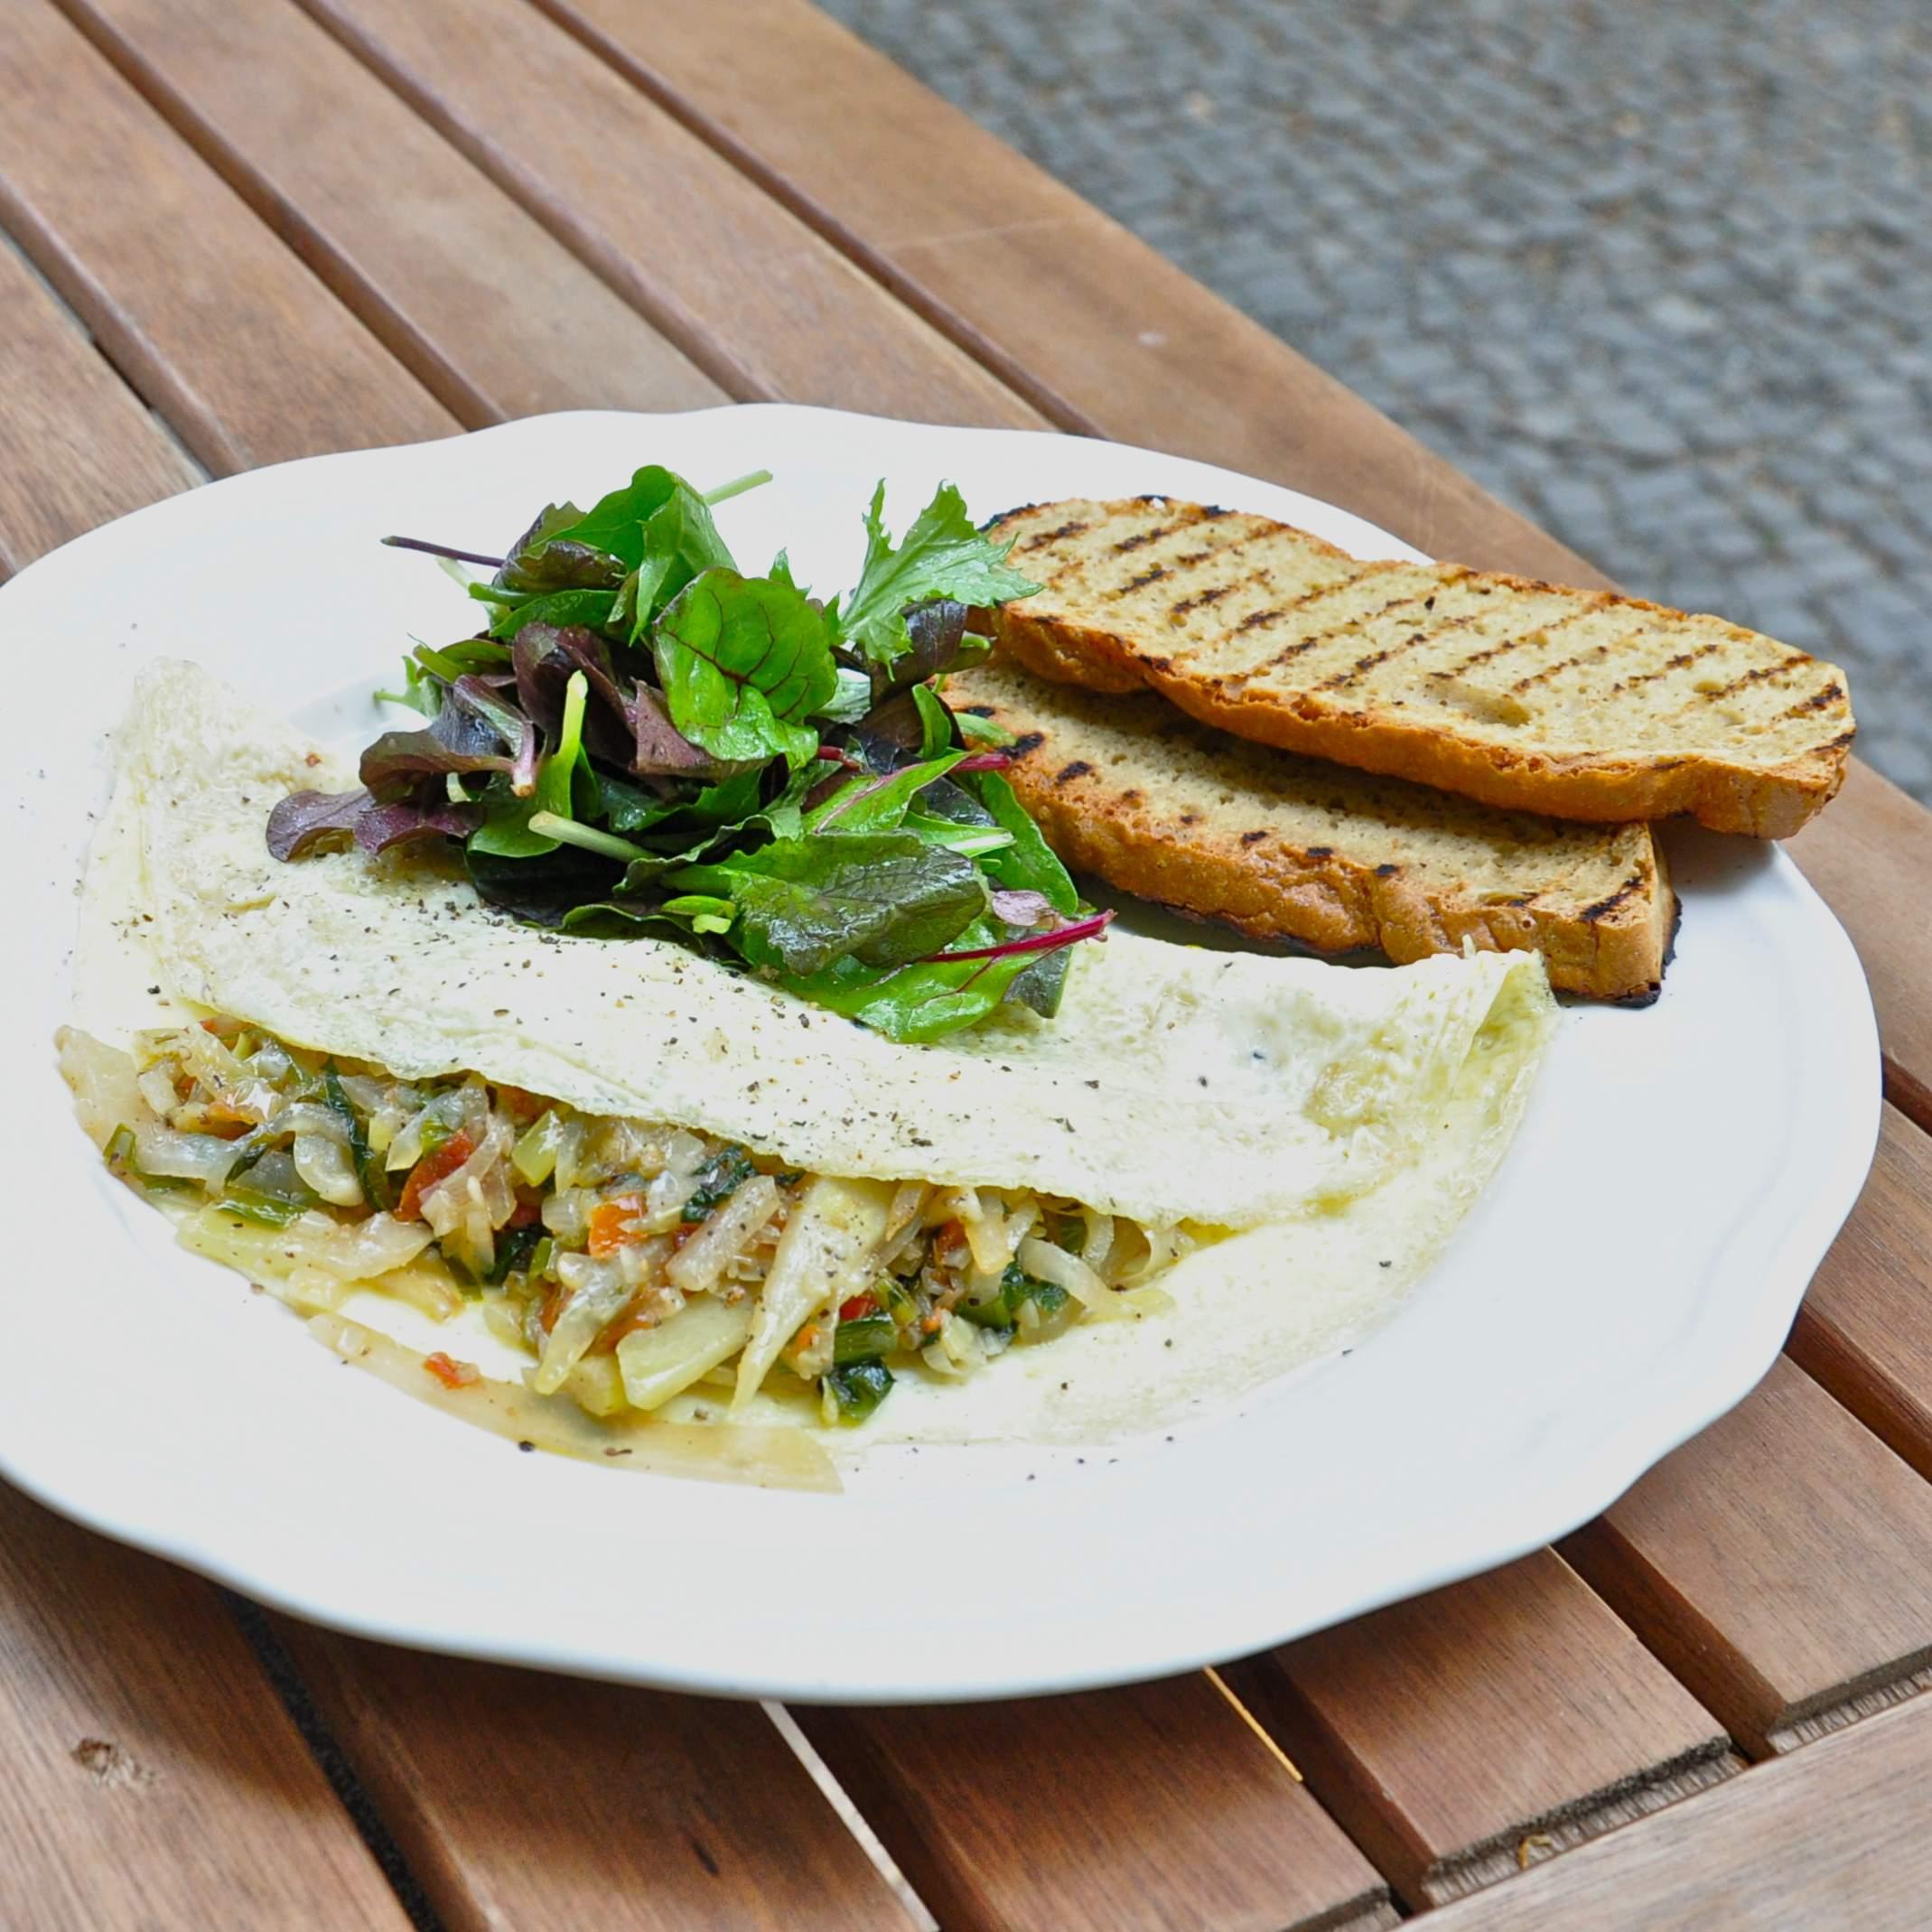 Sauvage-Berlin-Paleo-Restaurant-Fruehstueck-Omlette-Gemuese